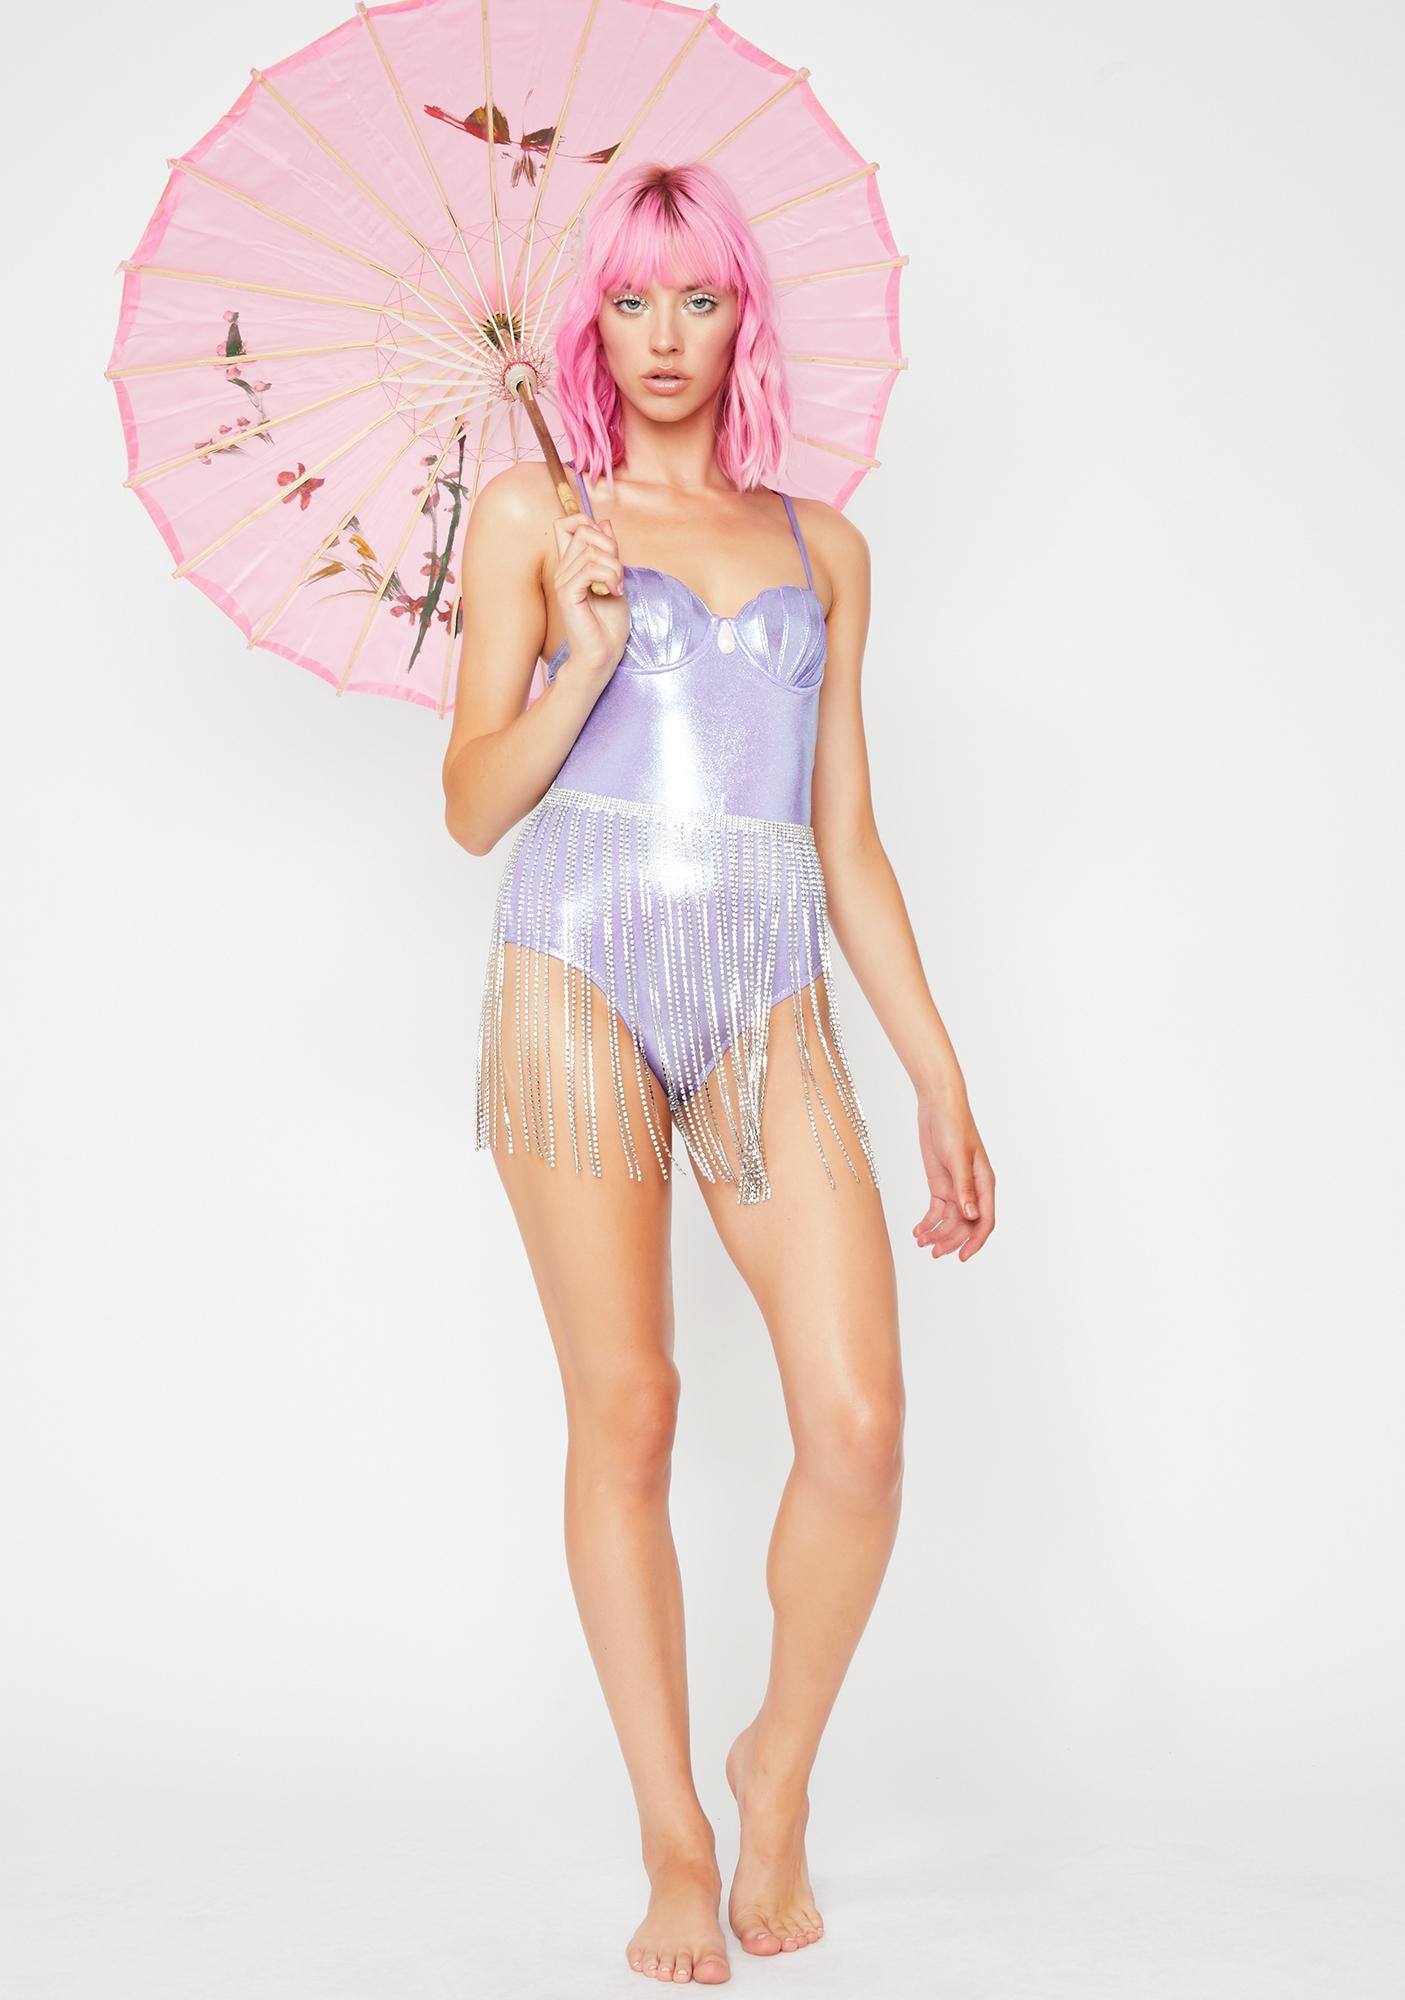 Margarita Mermaid Siren One Piece Bikini